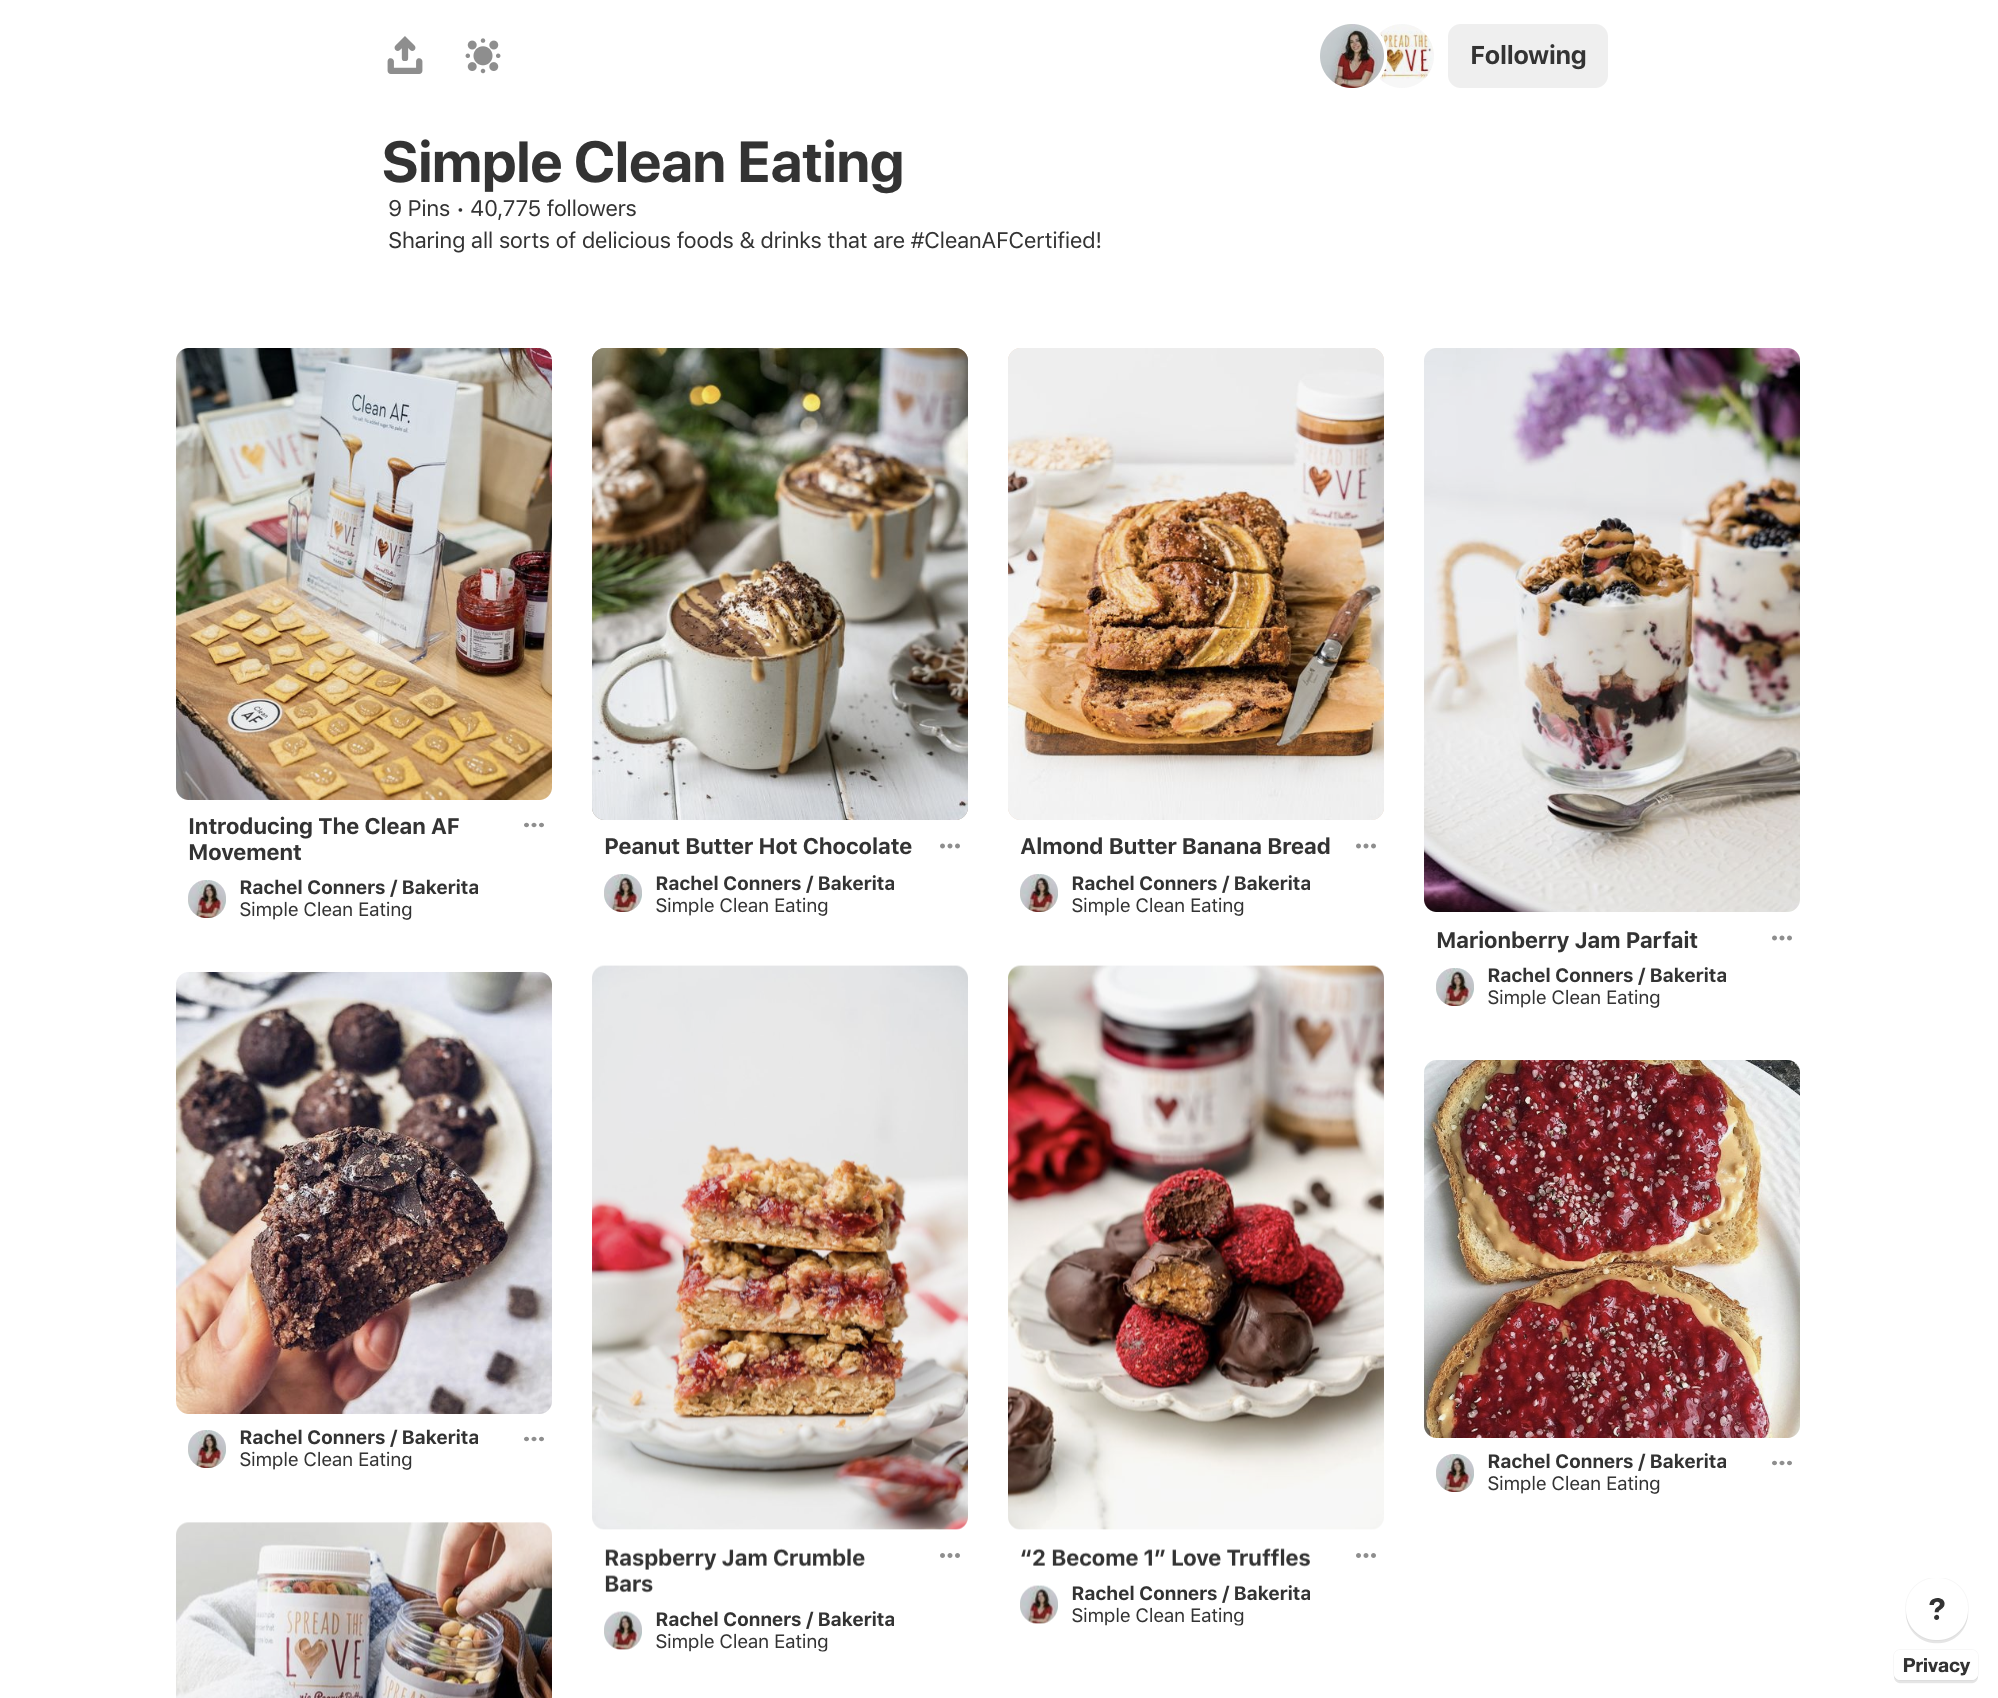 #CleanAFCertified Joint Pinterest Board with Influencer Rachel Conners of Bakerita -